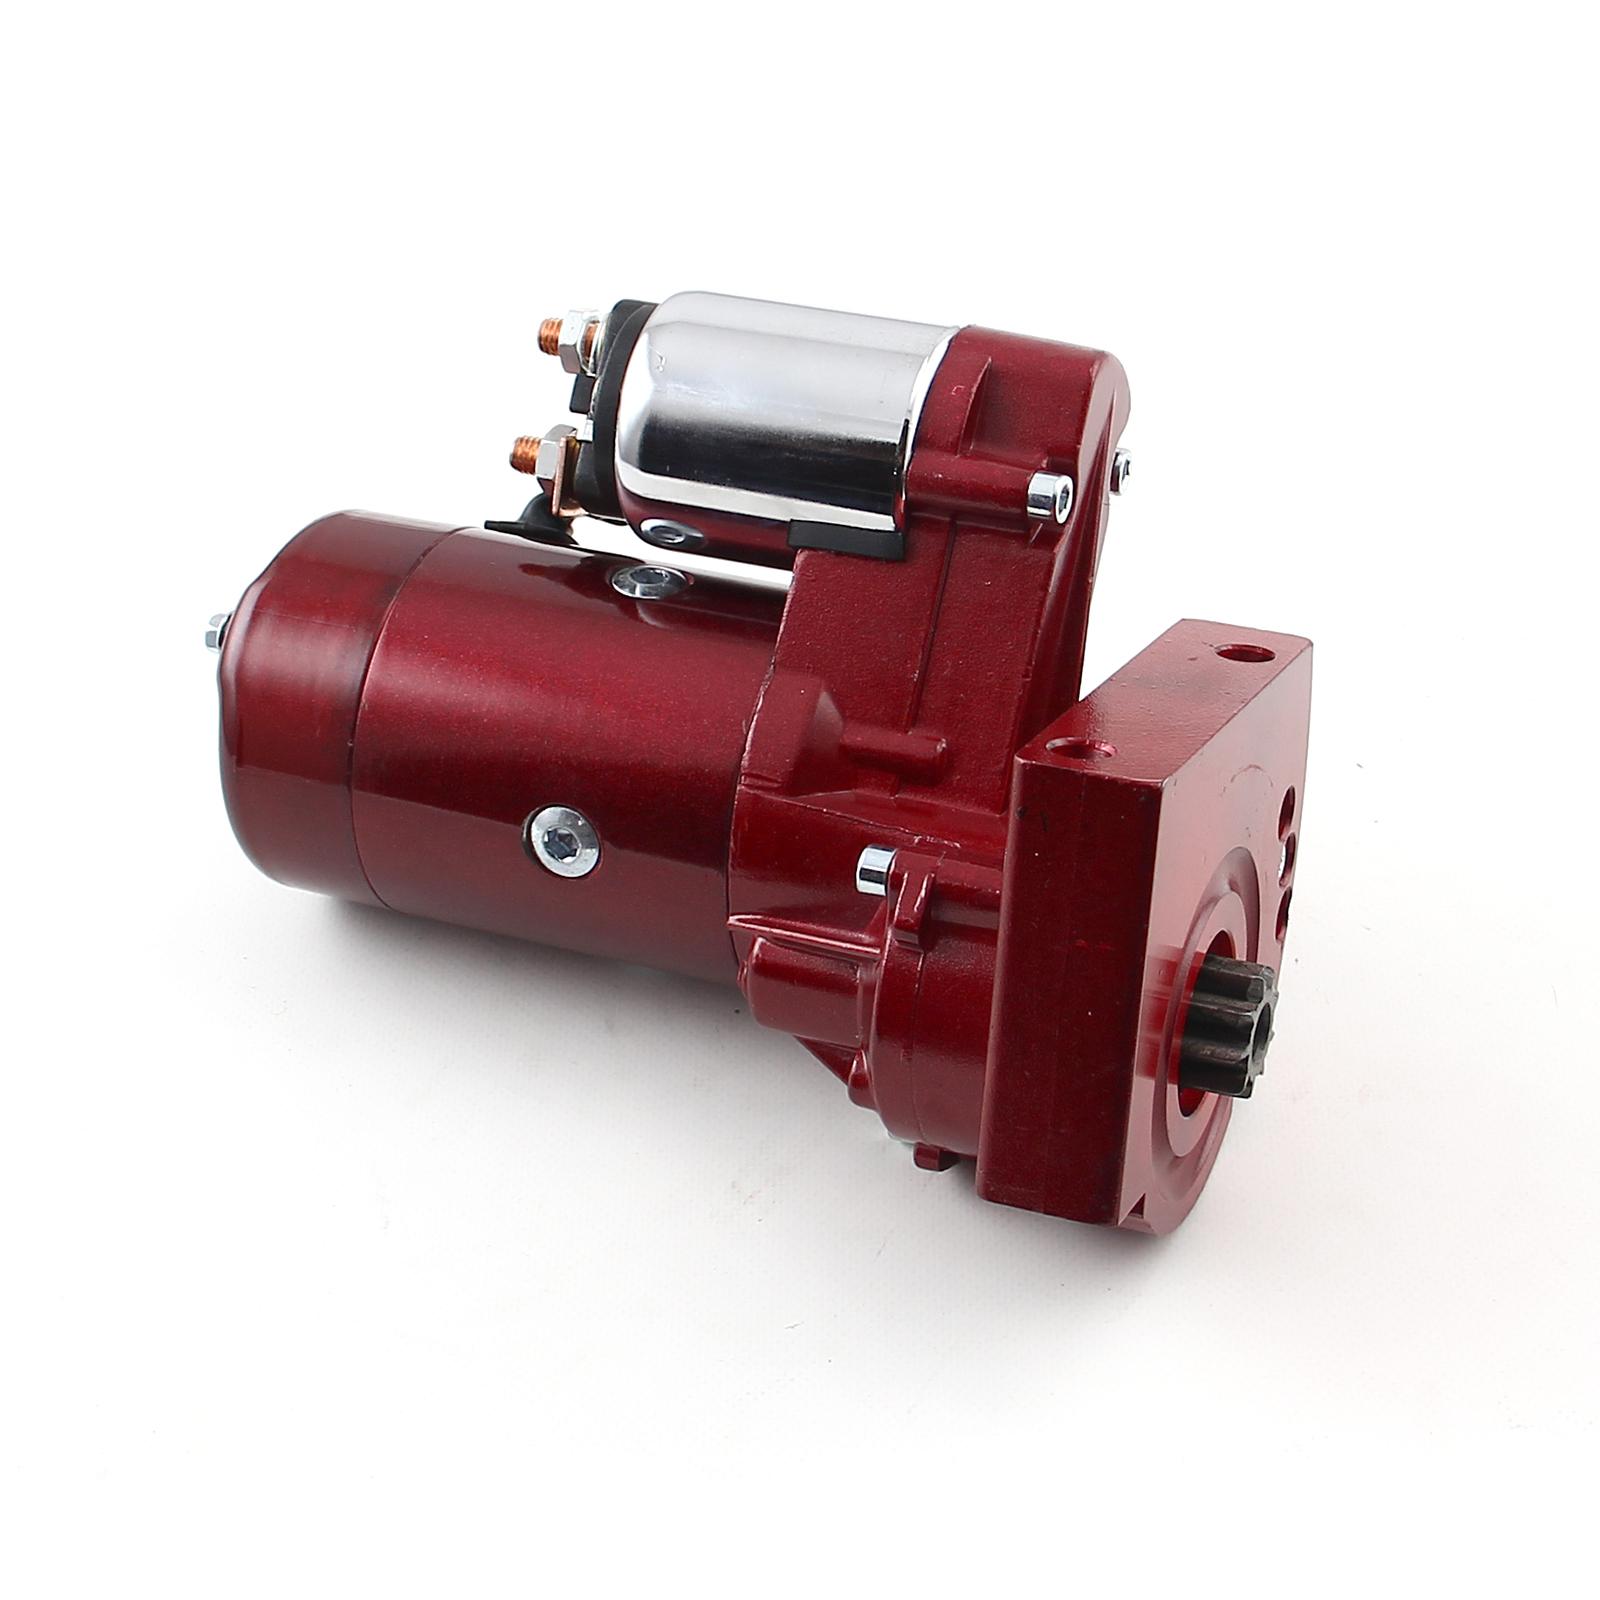 Chevy ls1 ls2 ls6 ls7 thunder 4 0hp high torque starter for Hi torque starter motor